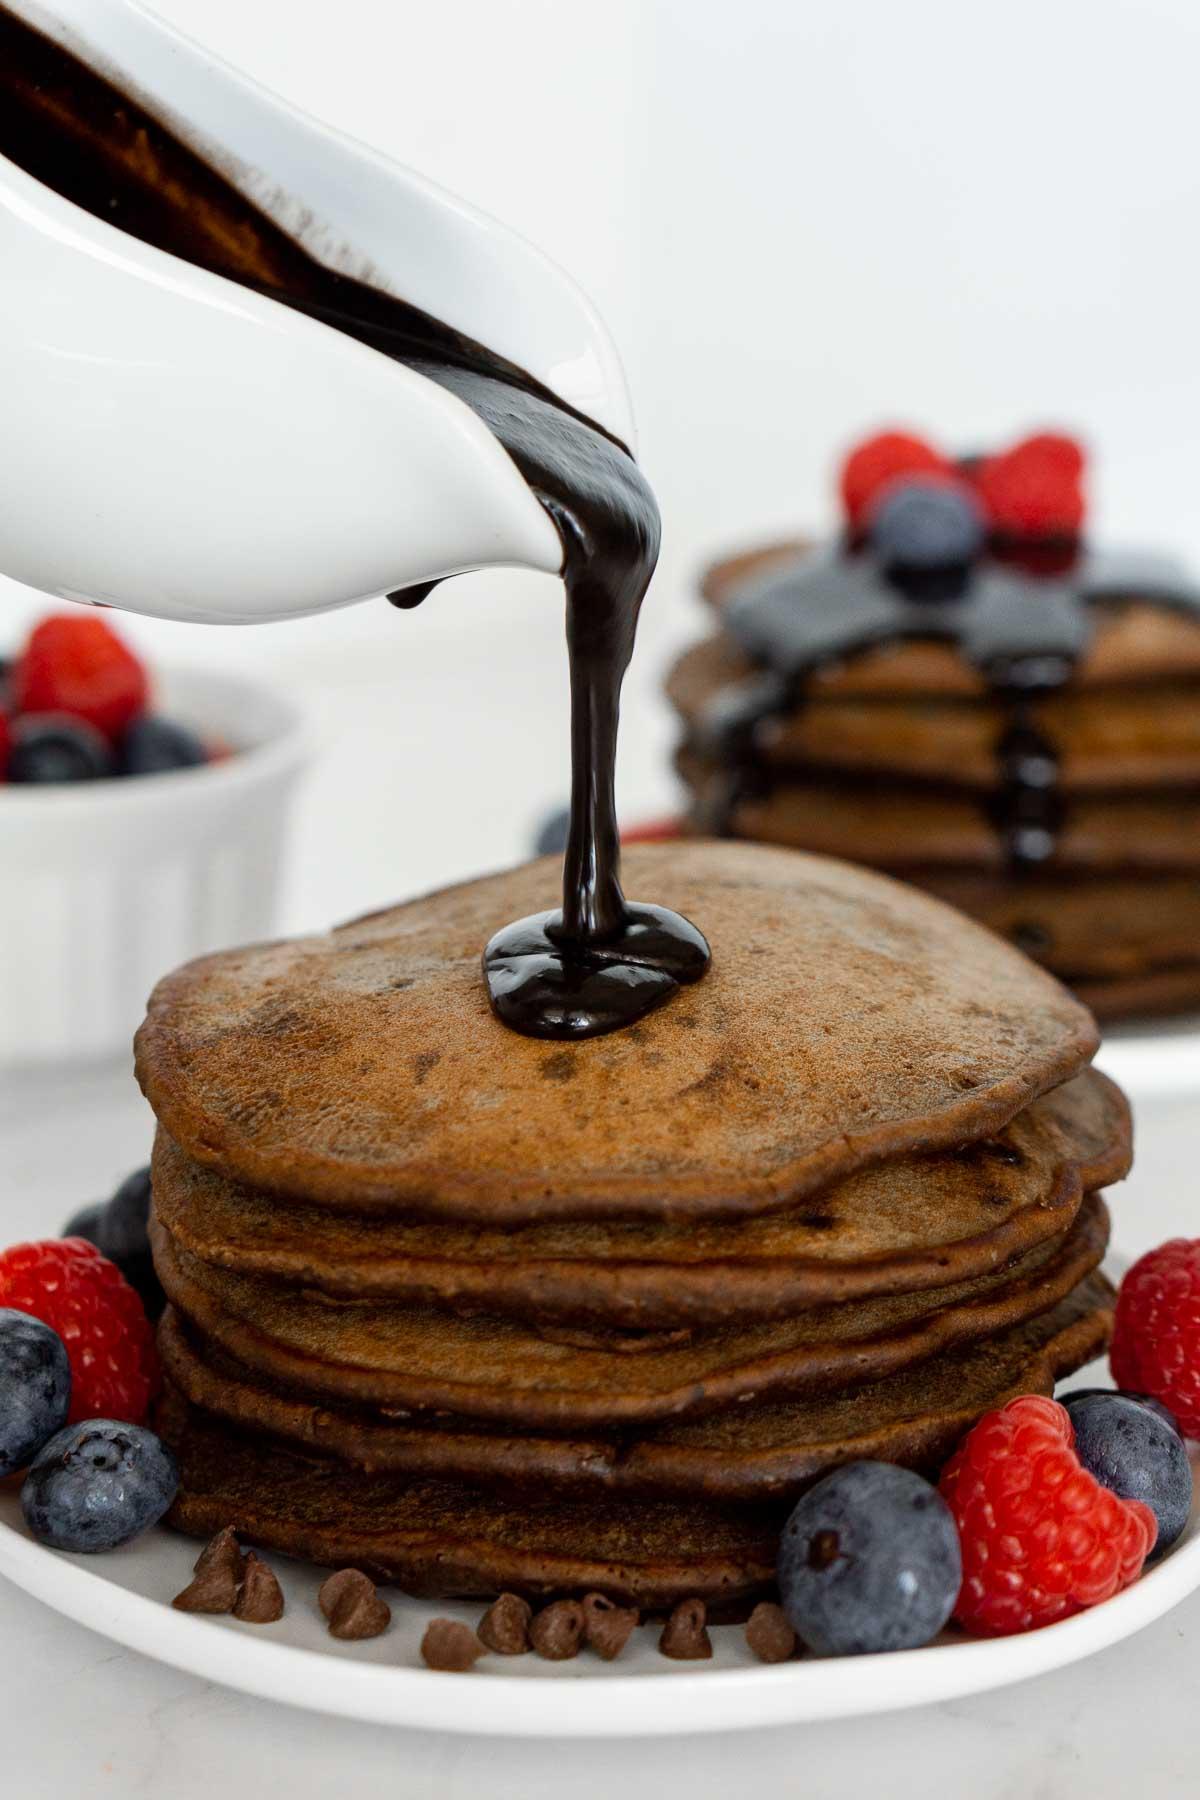 Pouring chocolate sauce on pancakes.